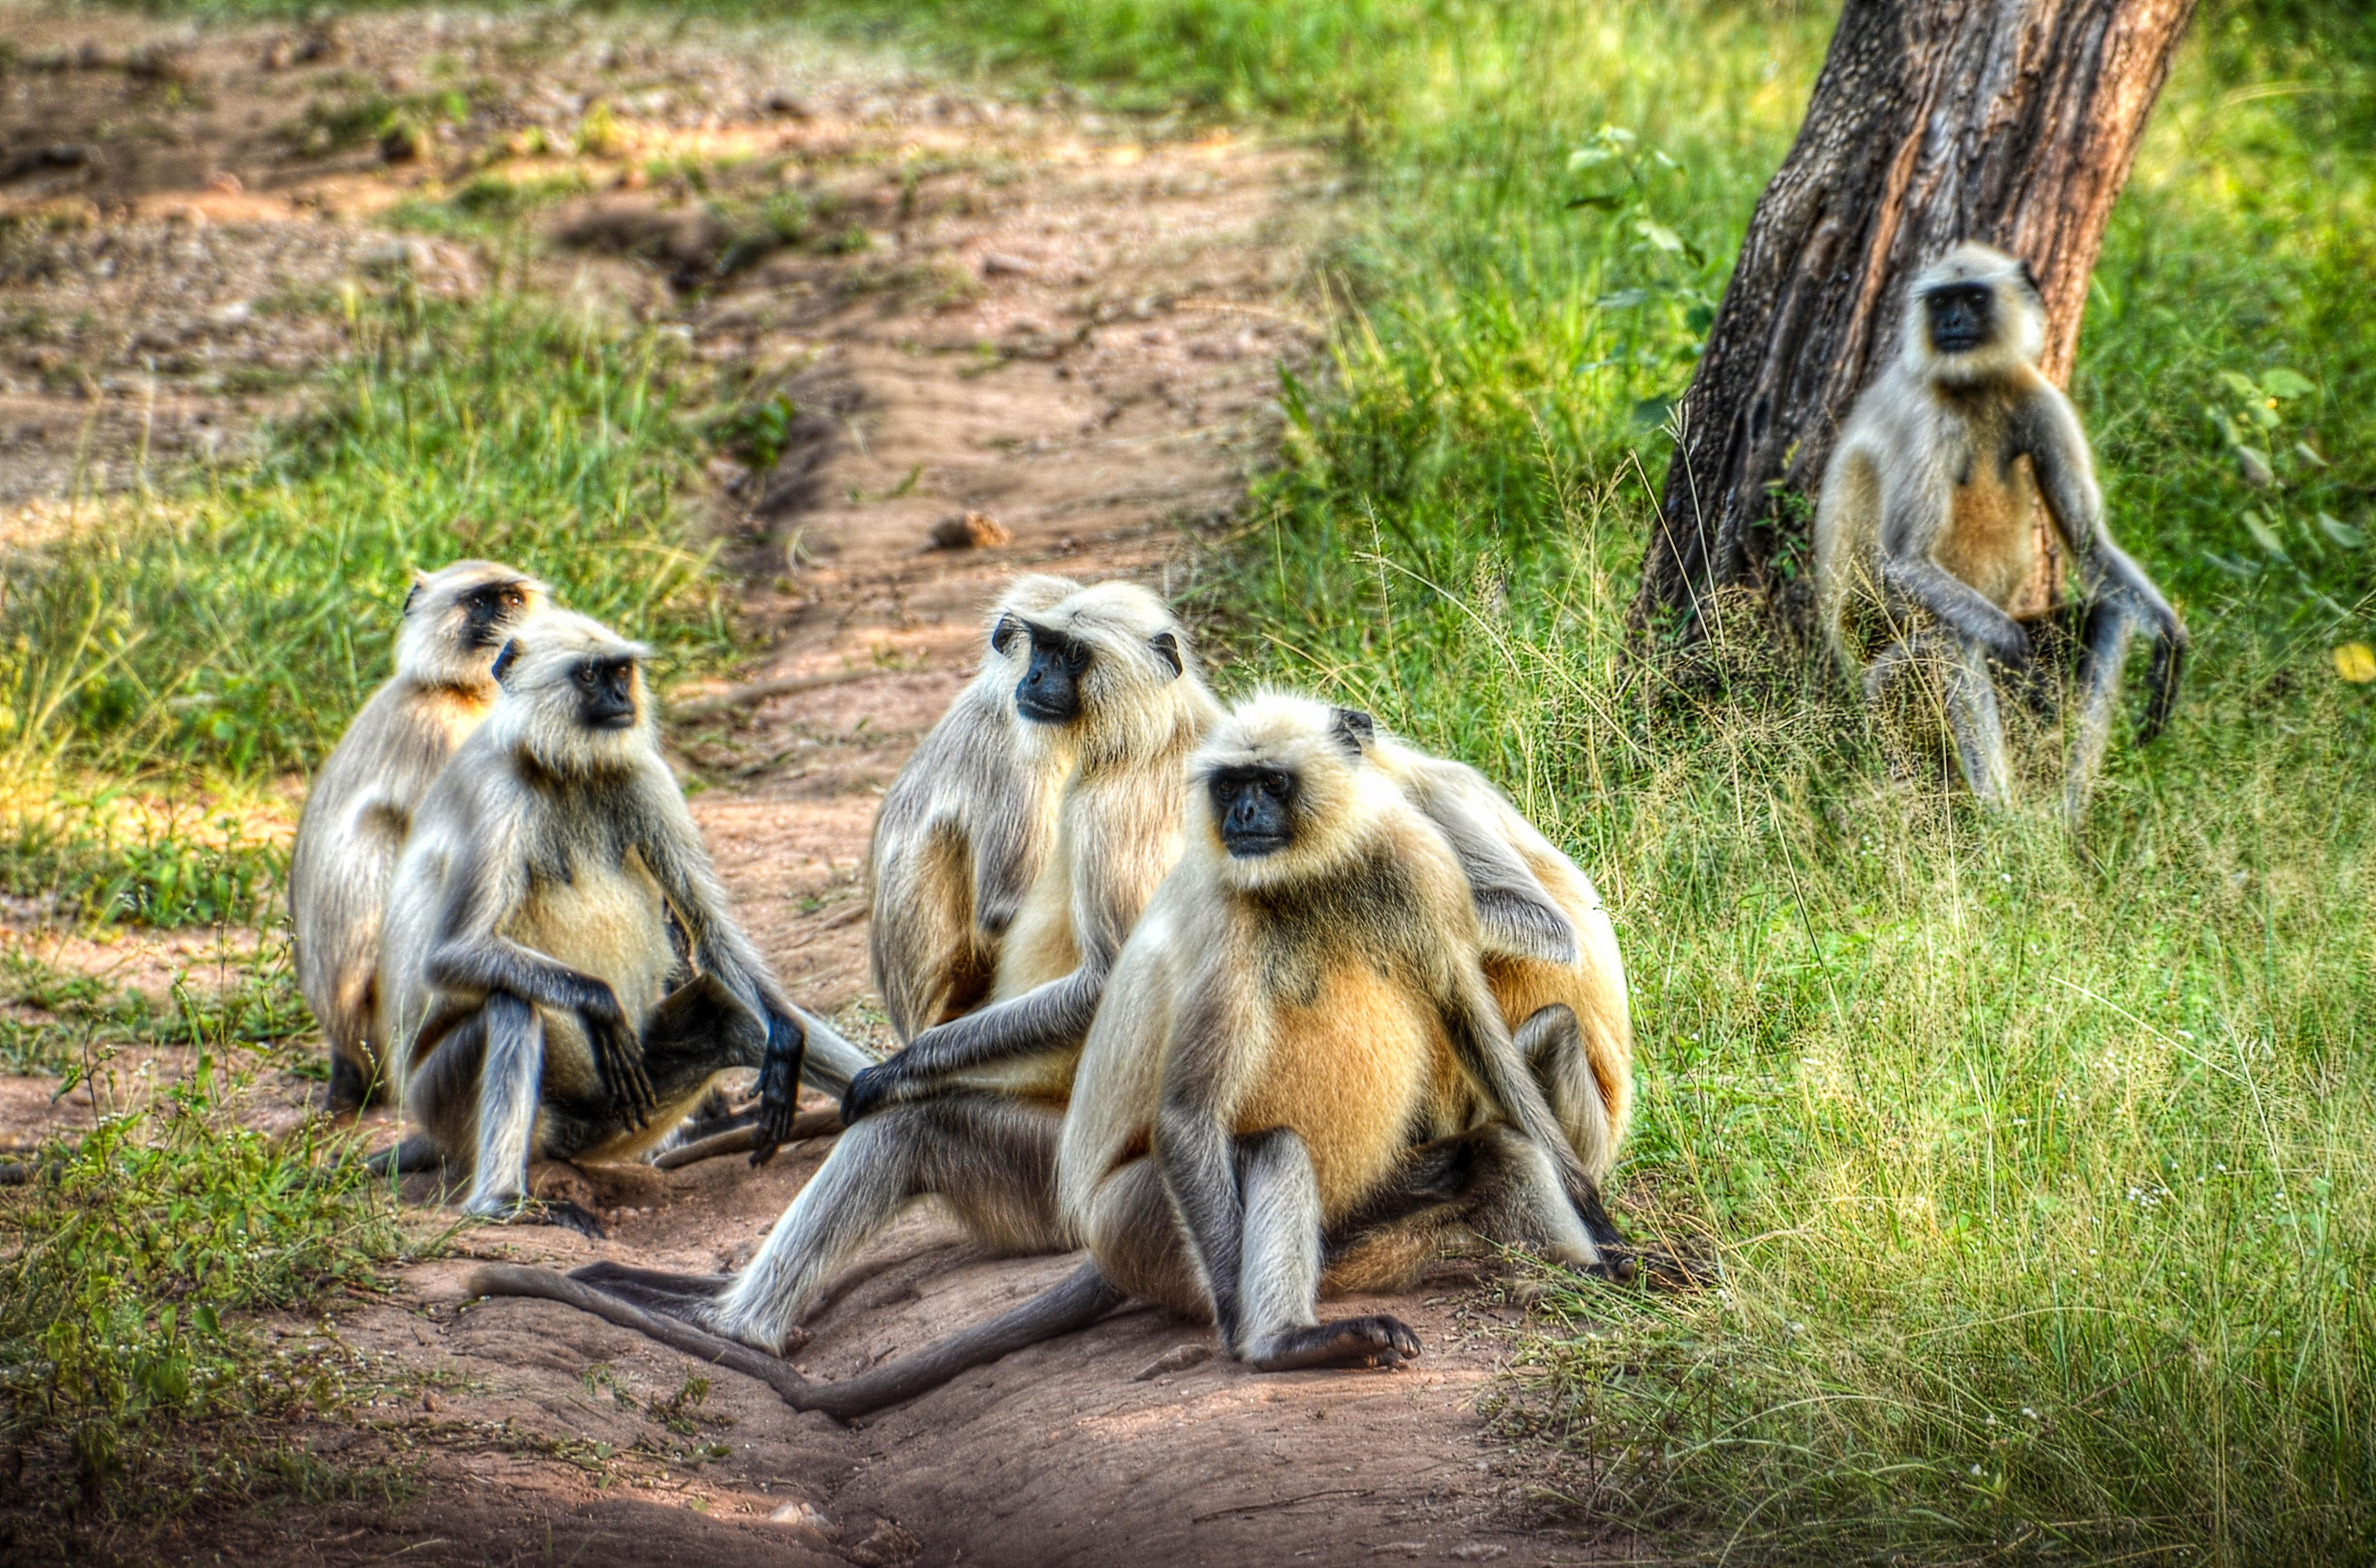 Group of primates on ground photo